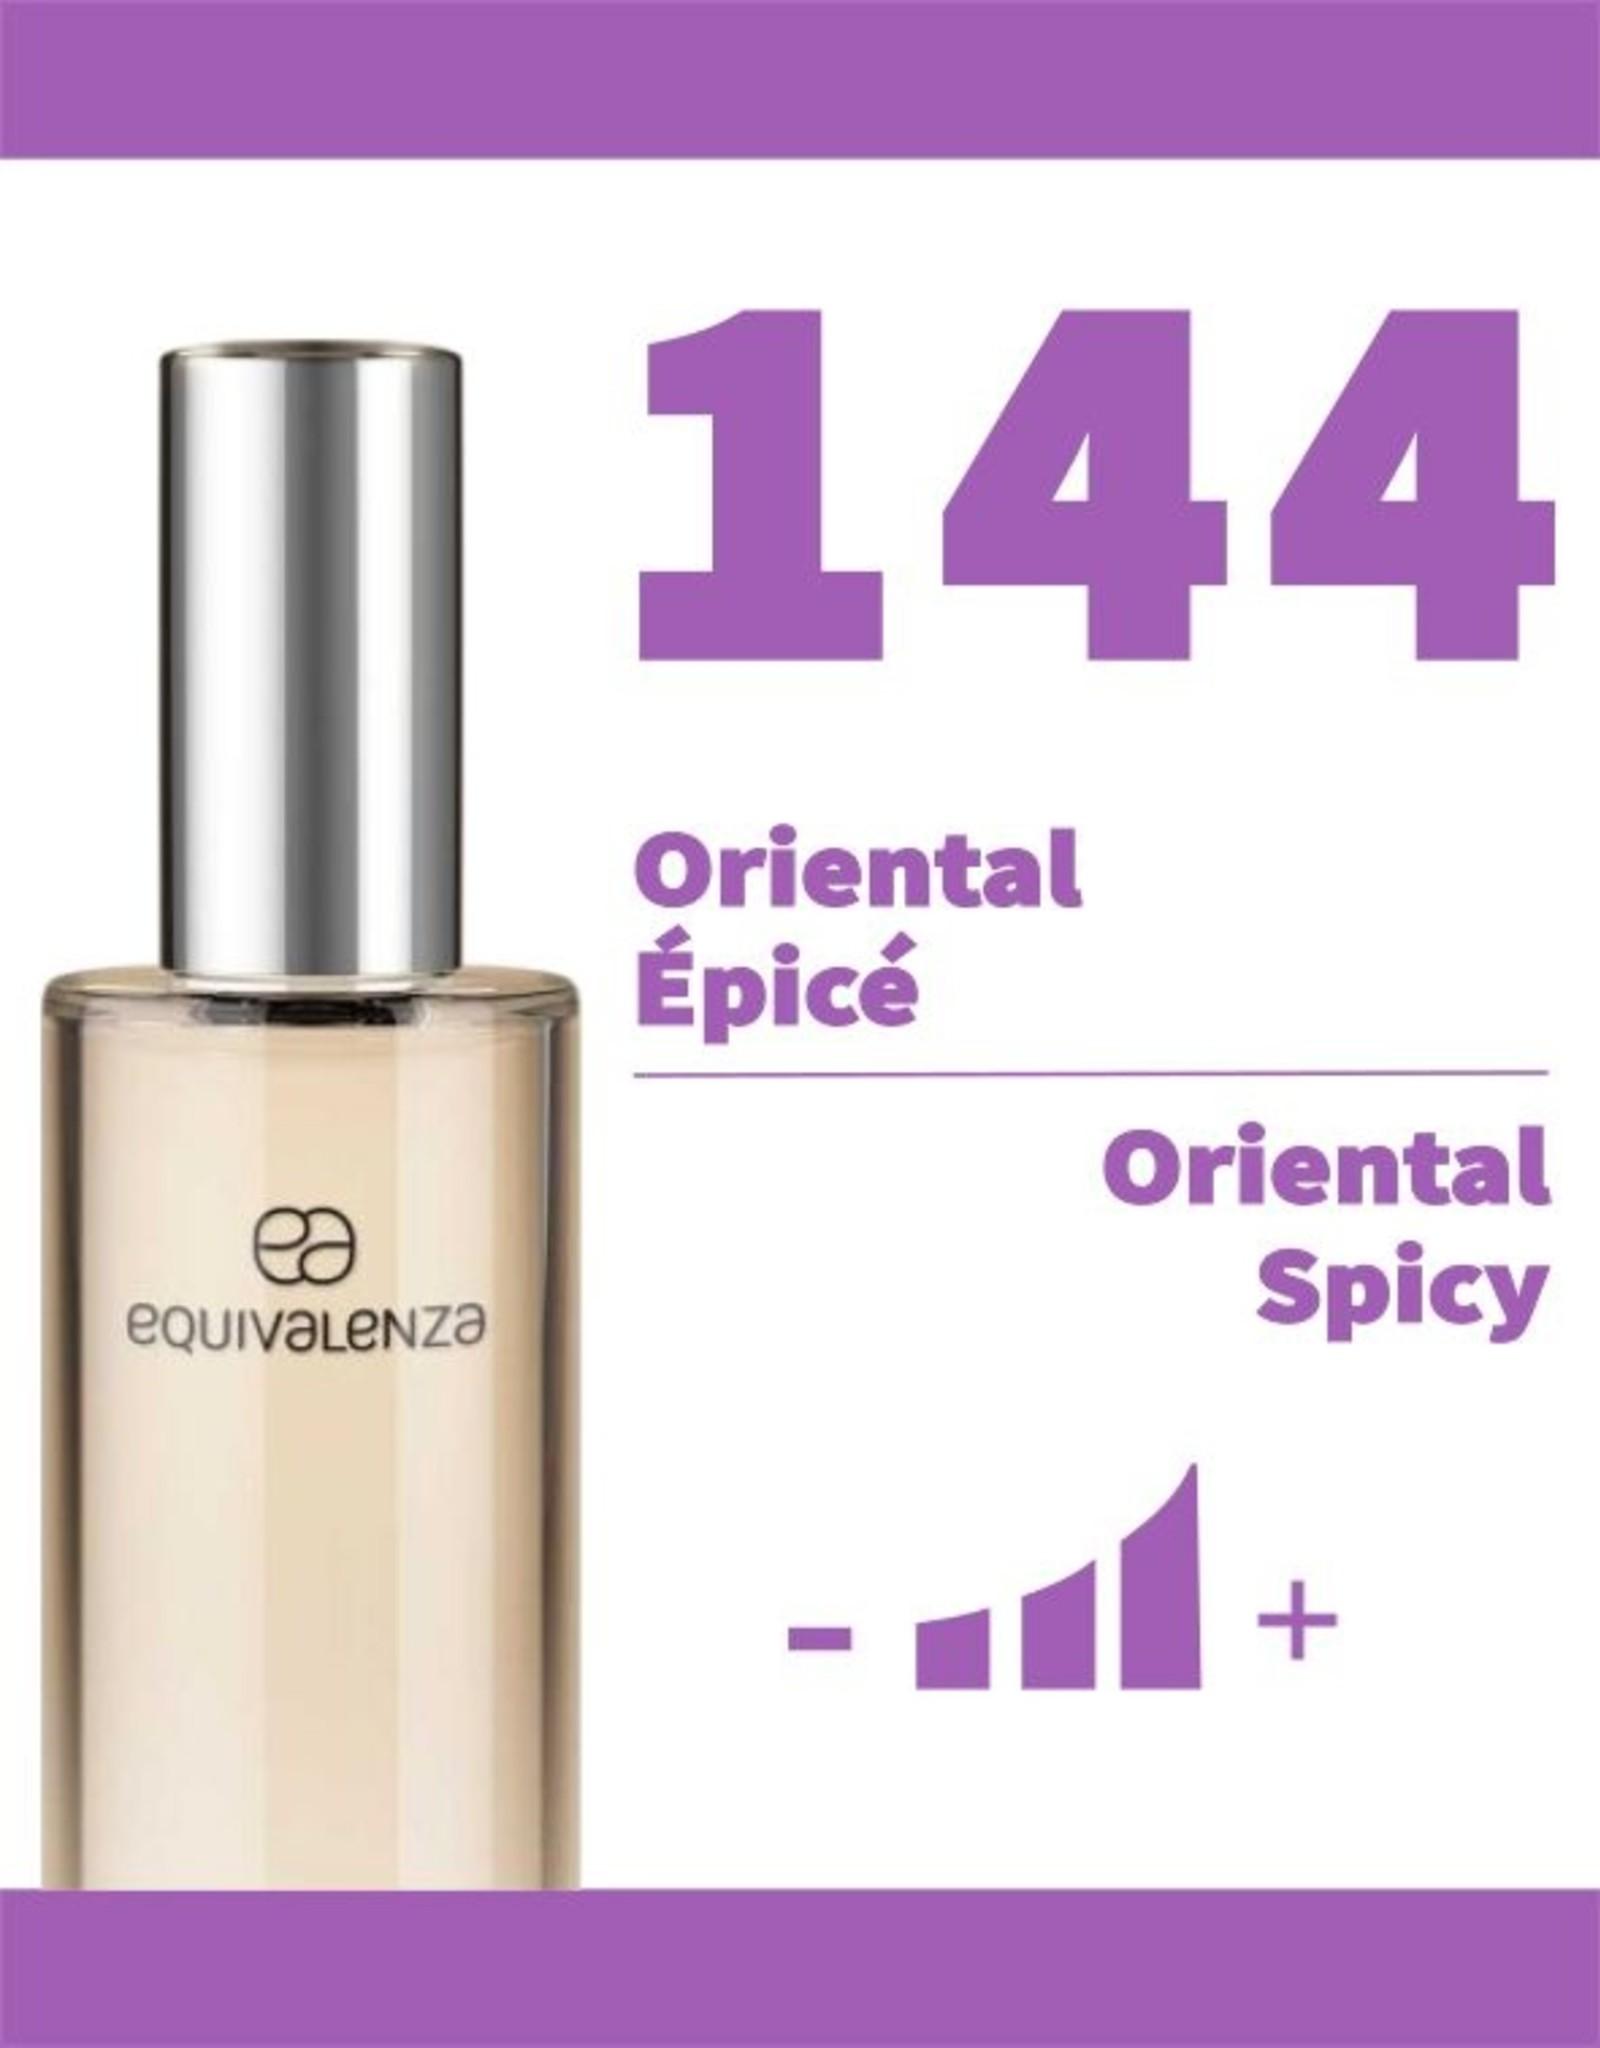 Equivalenza Oriental Spicy 144